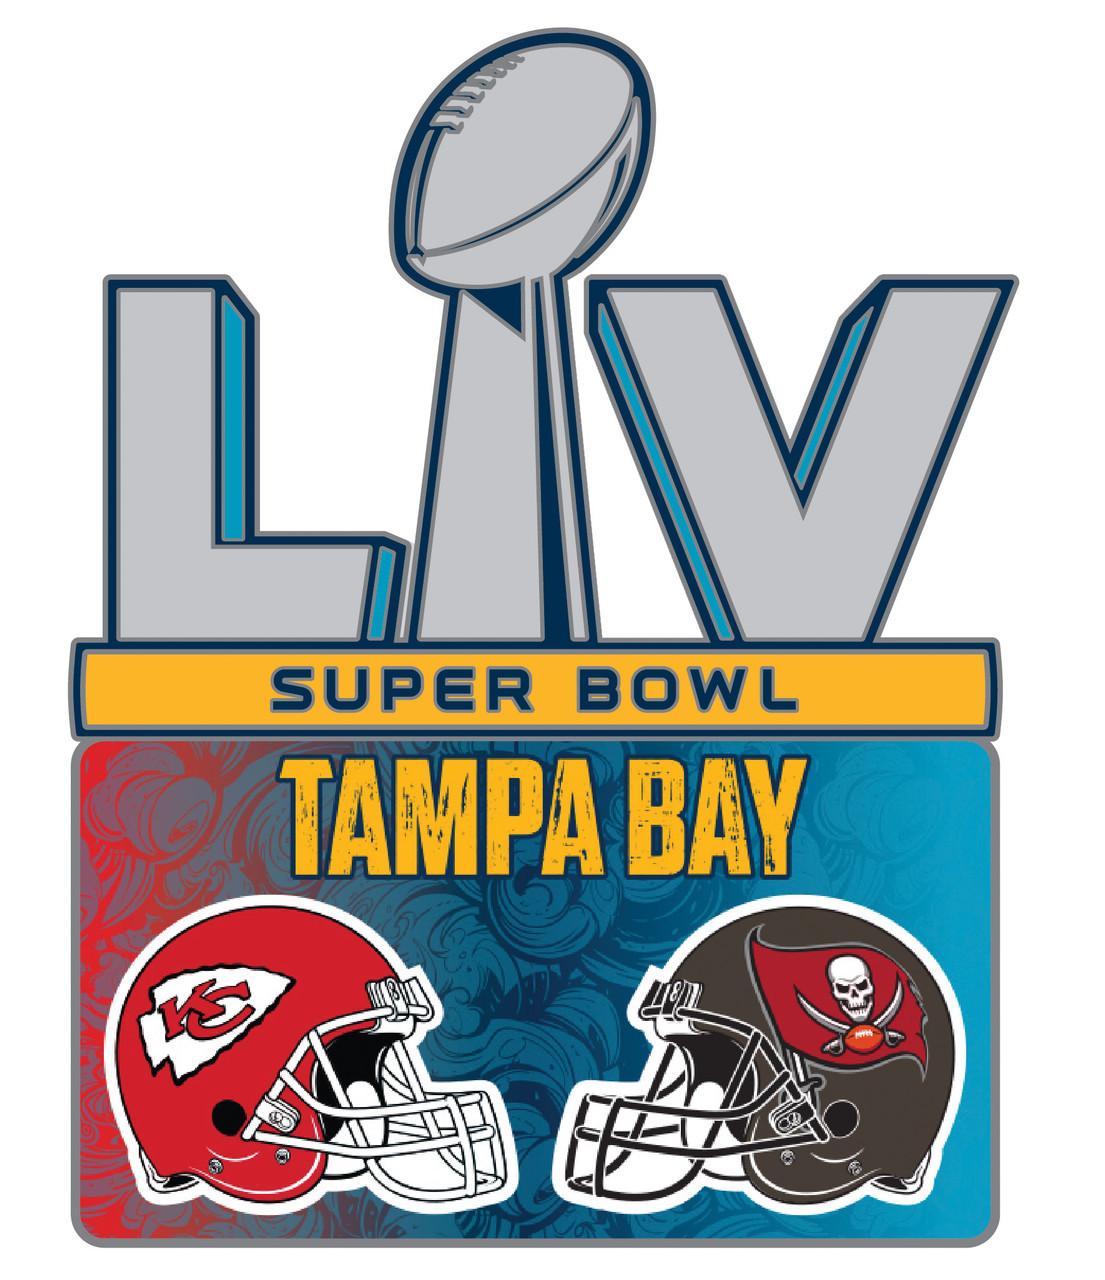 Kansas City Chiefs vs Tampa Bay Buccaneers Super Bowl LV 2021 Commemorative Dueling Football